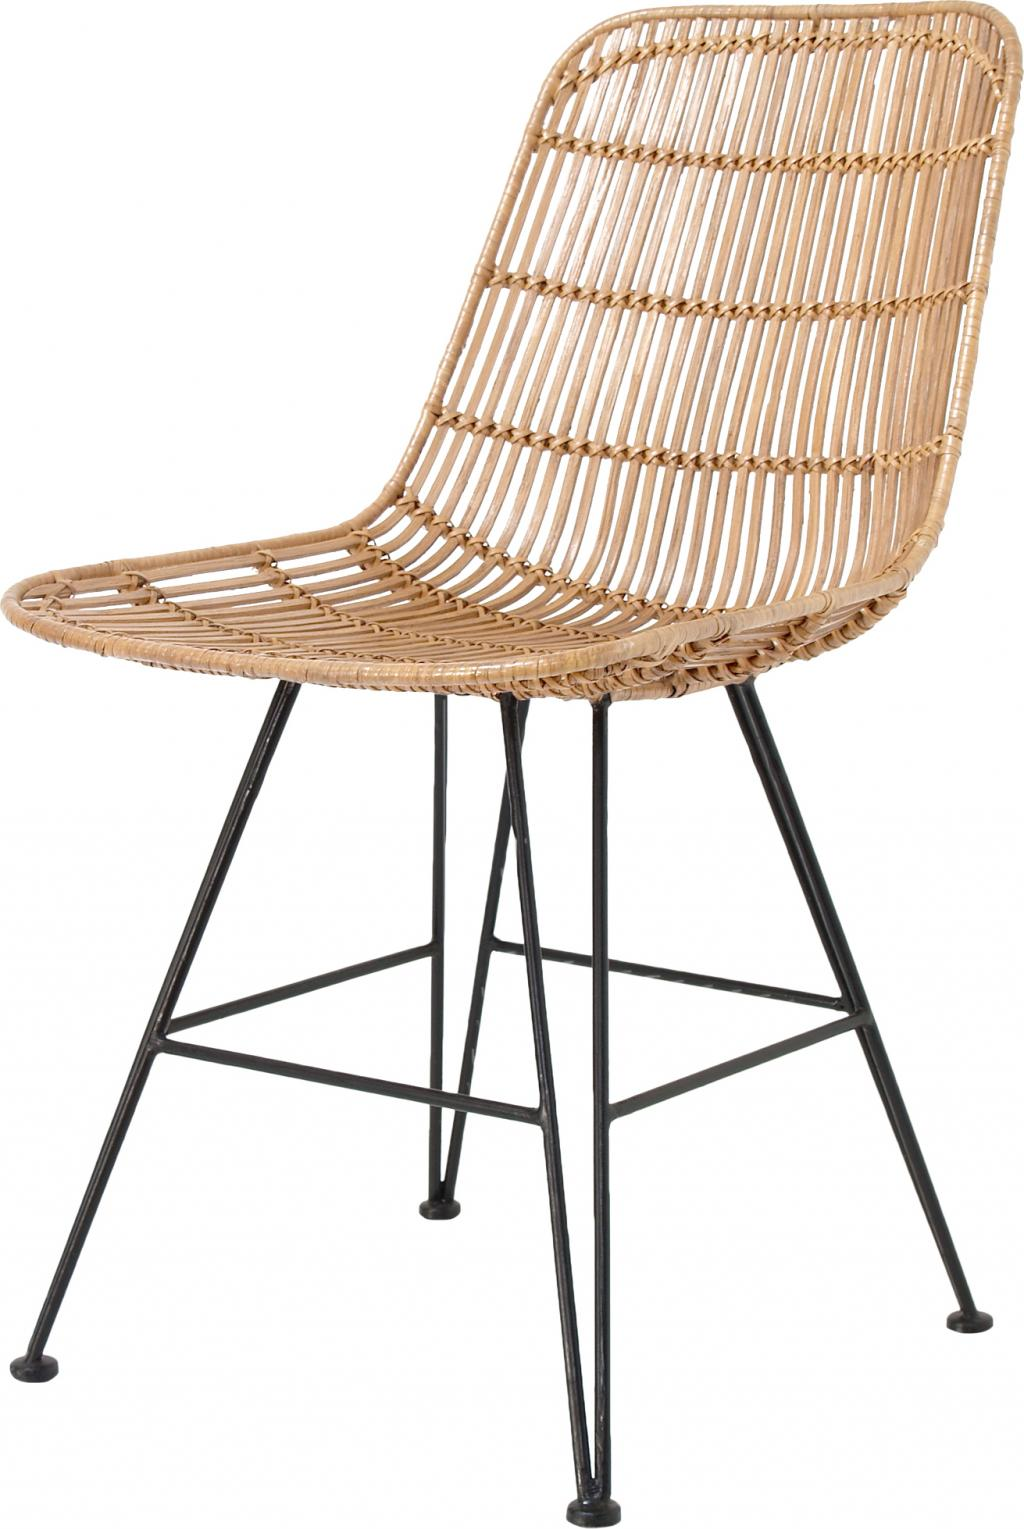 stuhl rattan naturell metall hk living kaufen wohn und lifestylewebshop. Black Bedroom Furniture Sets. Home Design Ideas